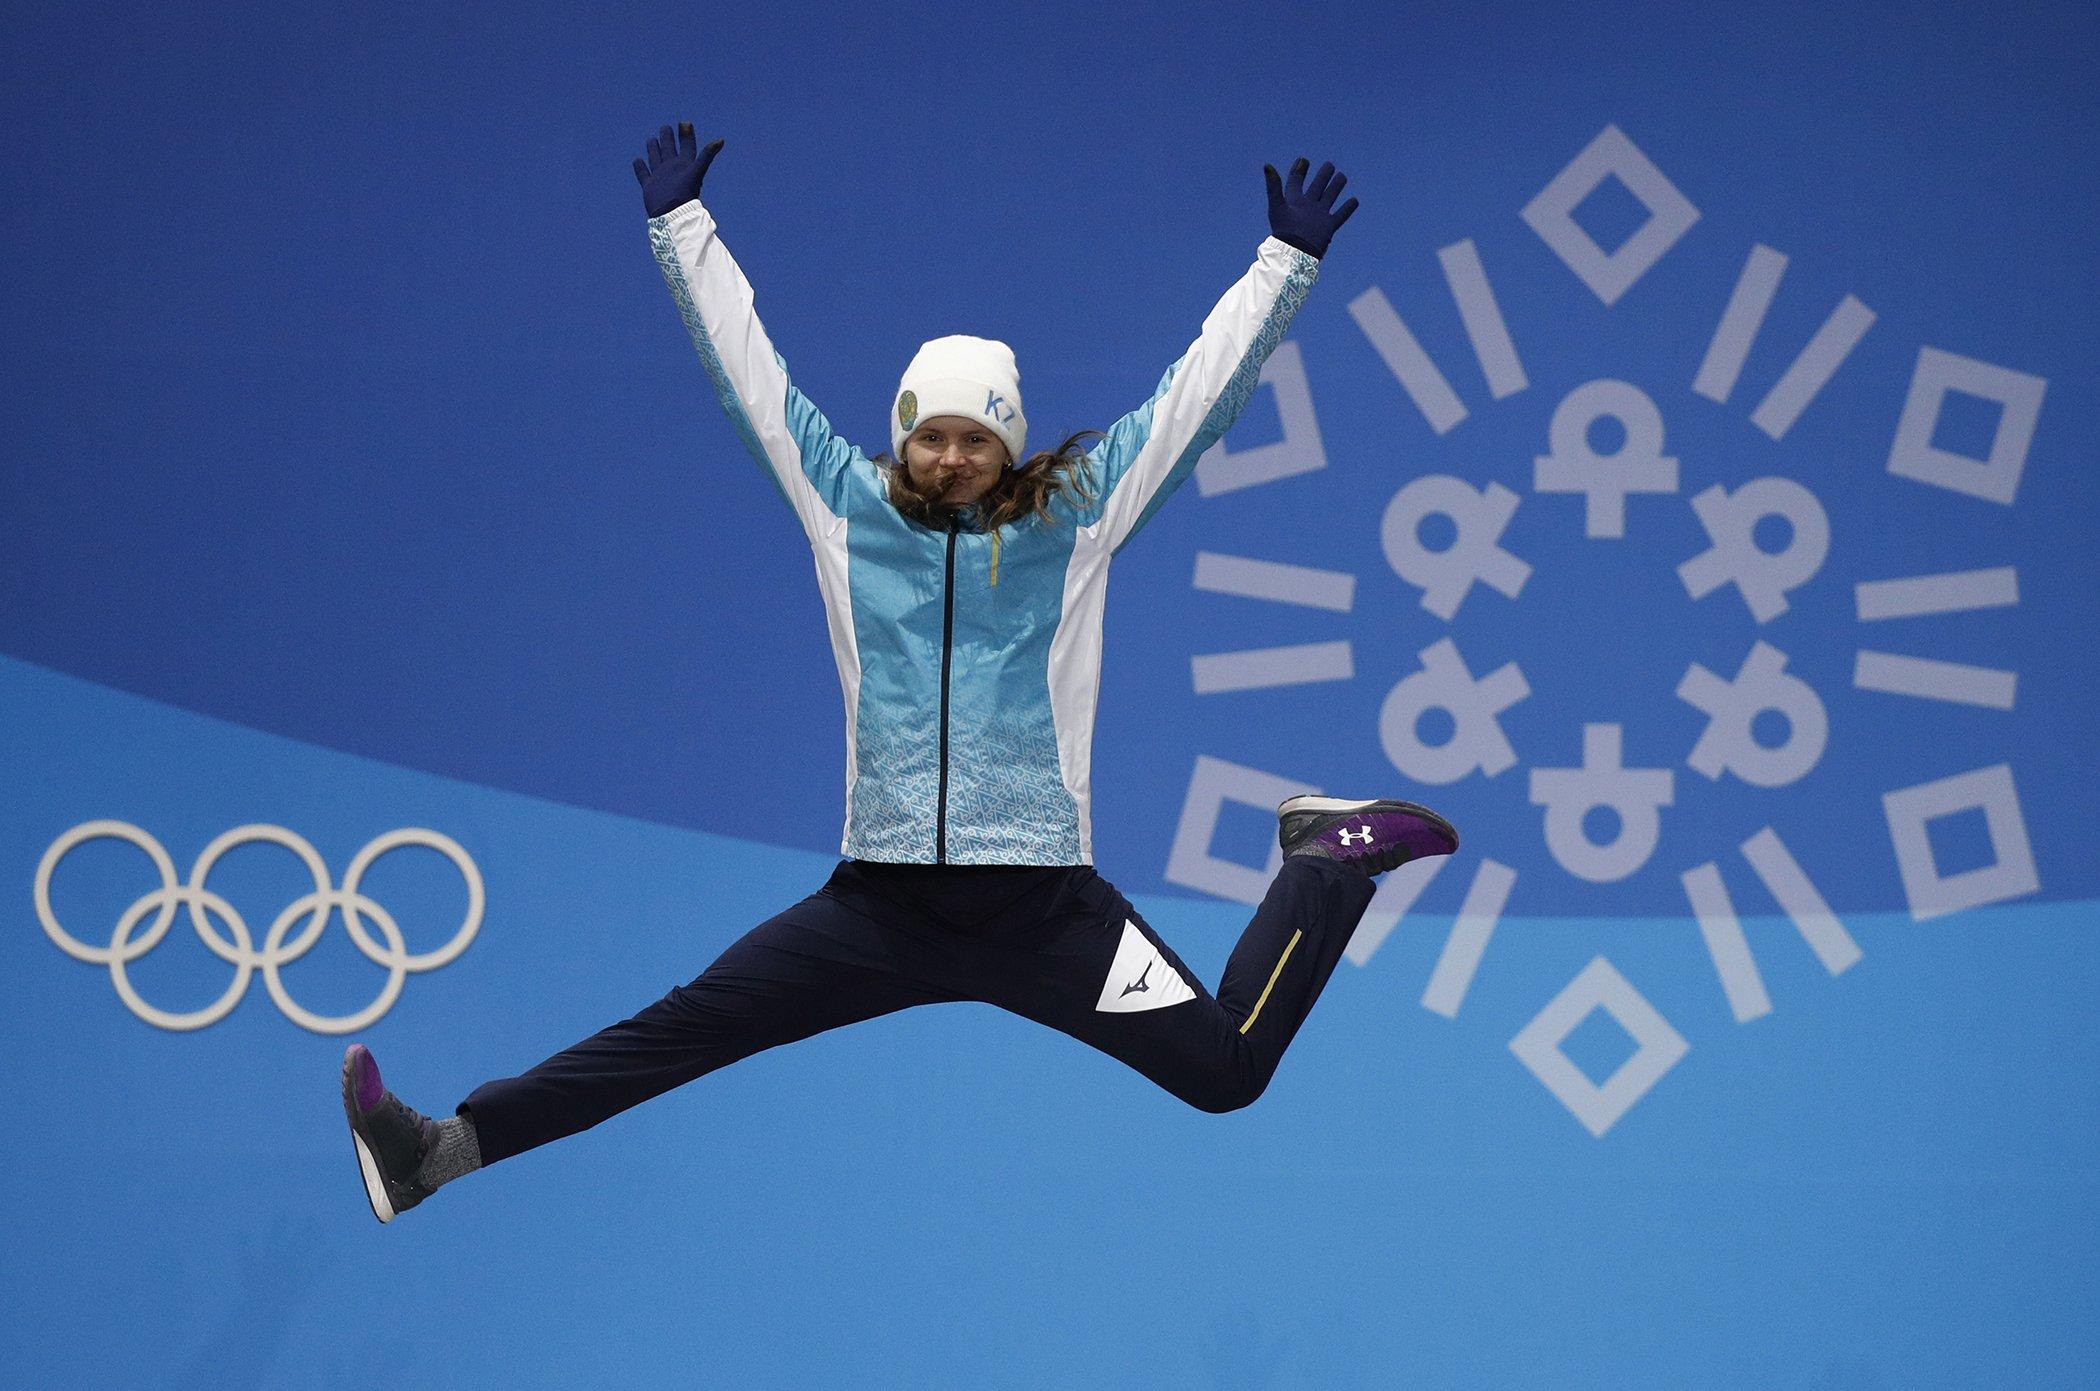 Olympics-Pyeongchang-Celebration.jpg